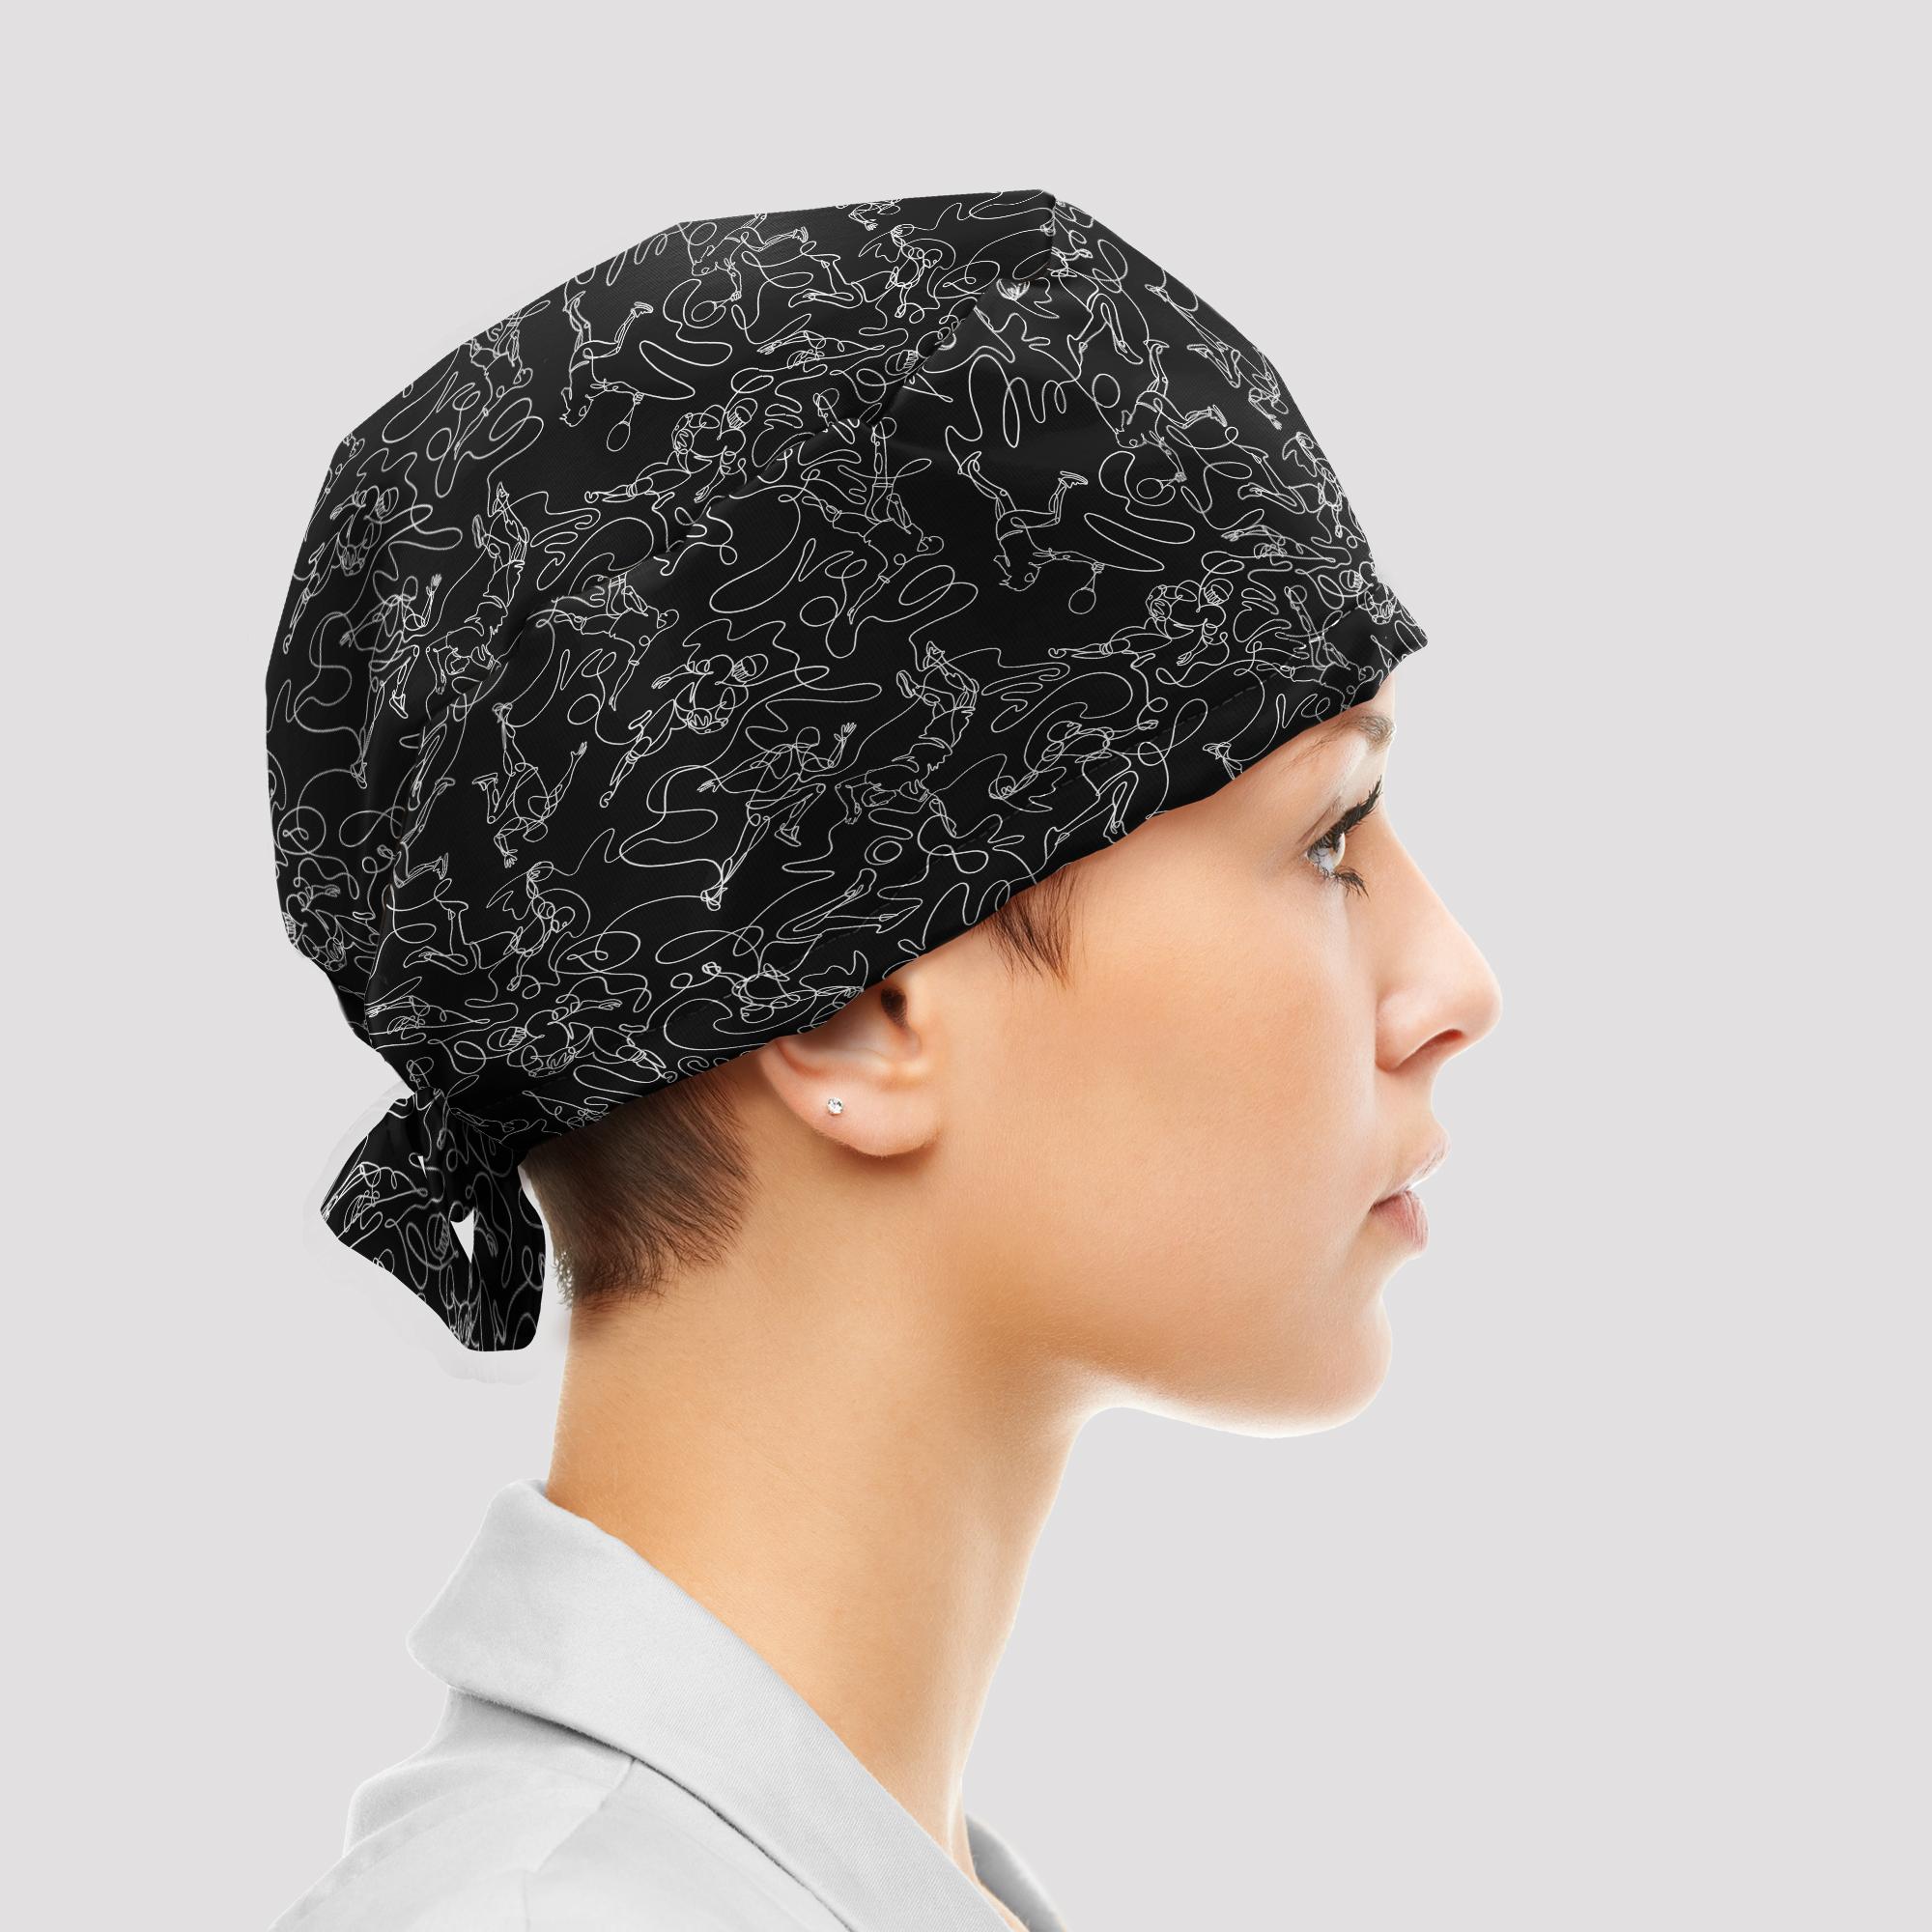 Gorro sanitario – ¿Para pelo largo o corto?